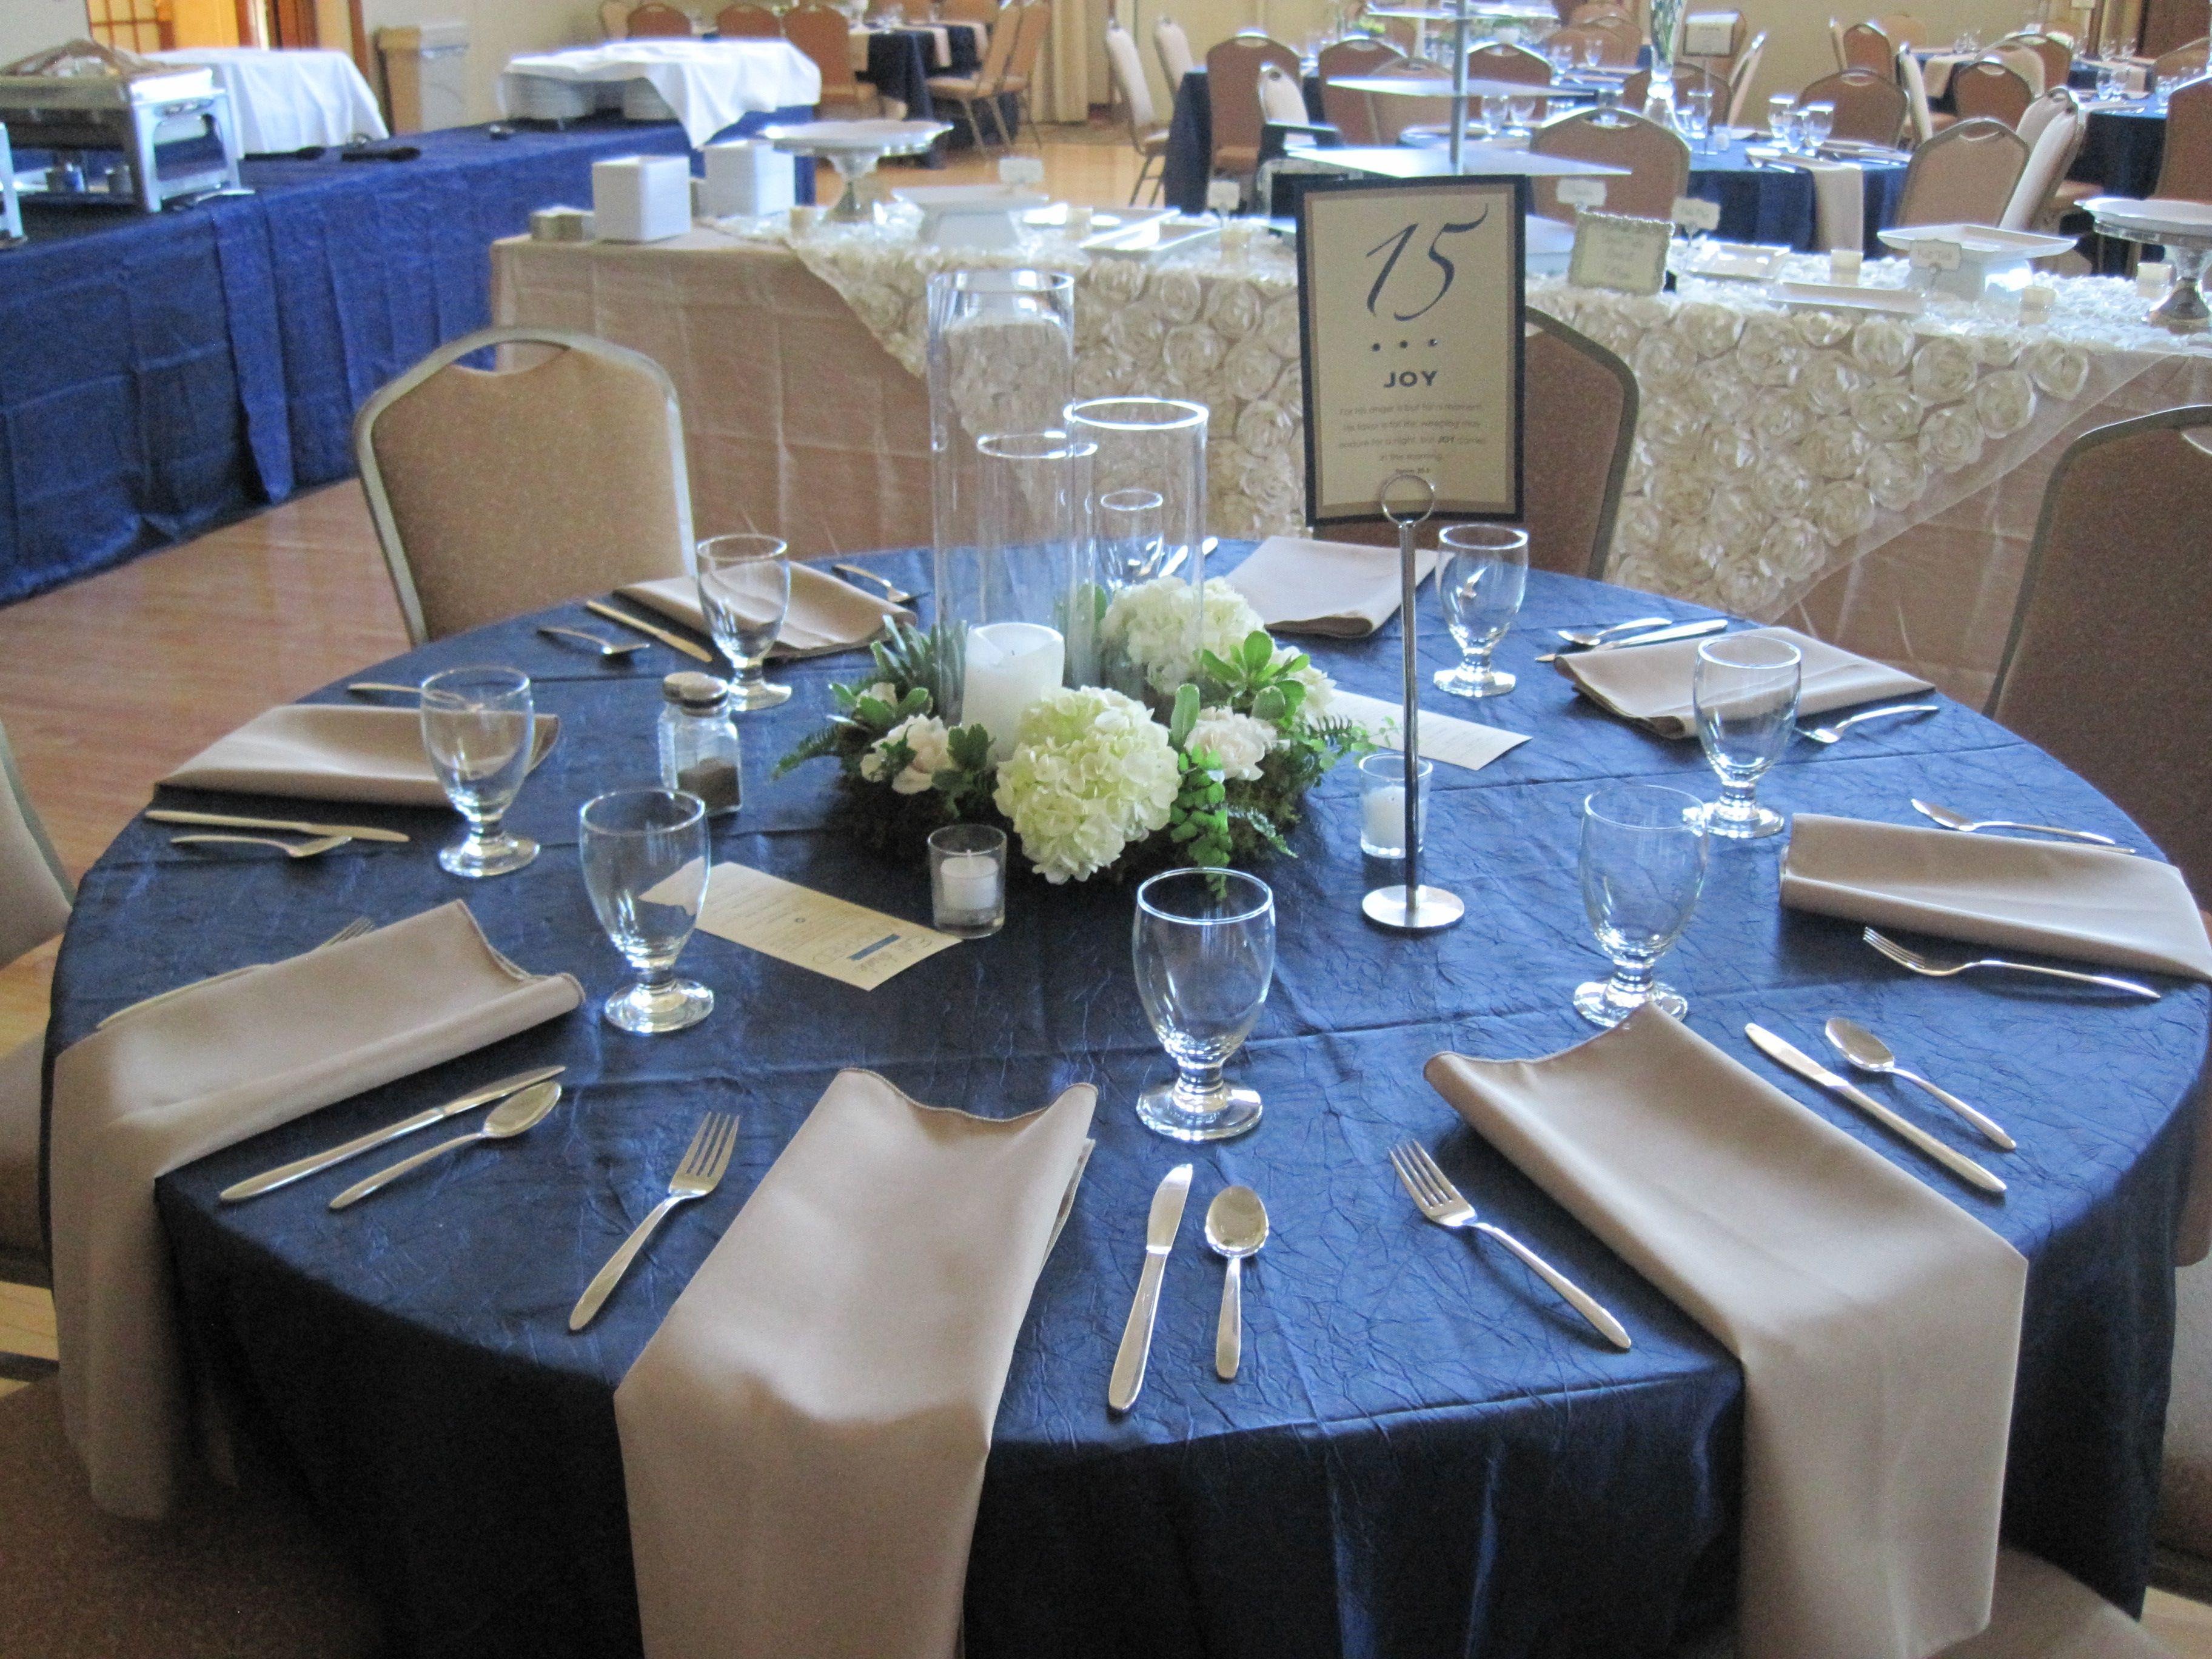 Glencoe City Center, Deep Blue Table Cloth, Table Setting, White